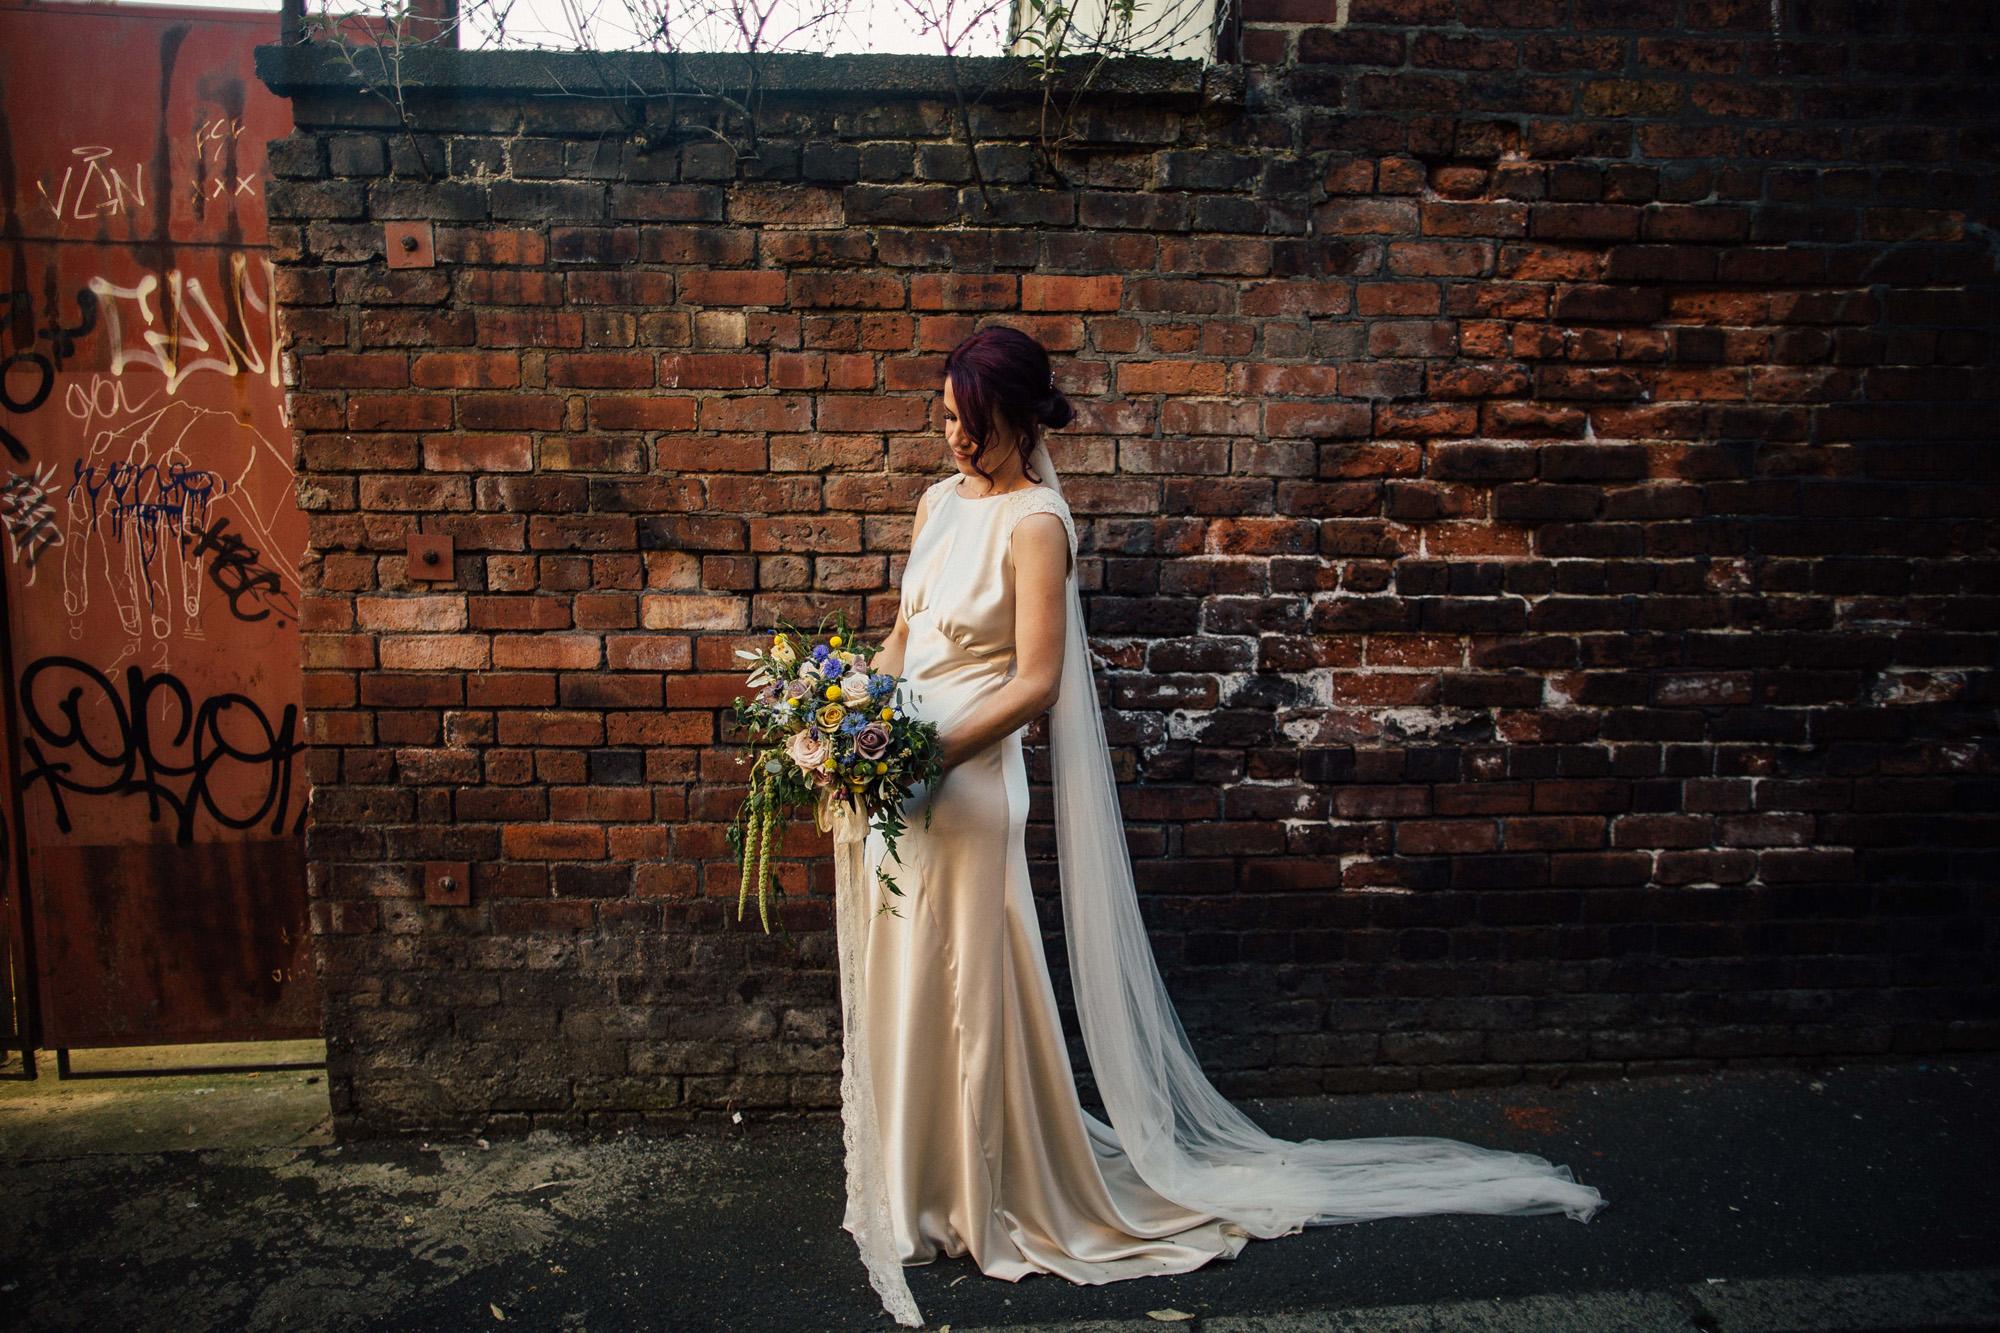 Sarah-Honeysuckle-Bias-Cut-Silk-Vintage-Inspired-Wedding-Gown-Sheffield-Wedding-Kate-Beaumont-59.jpg